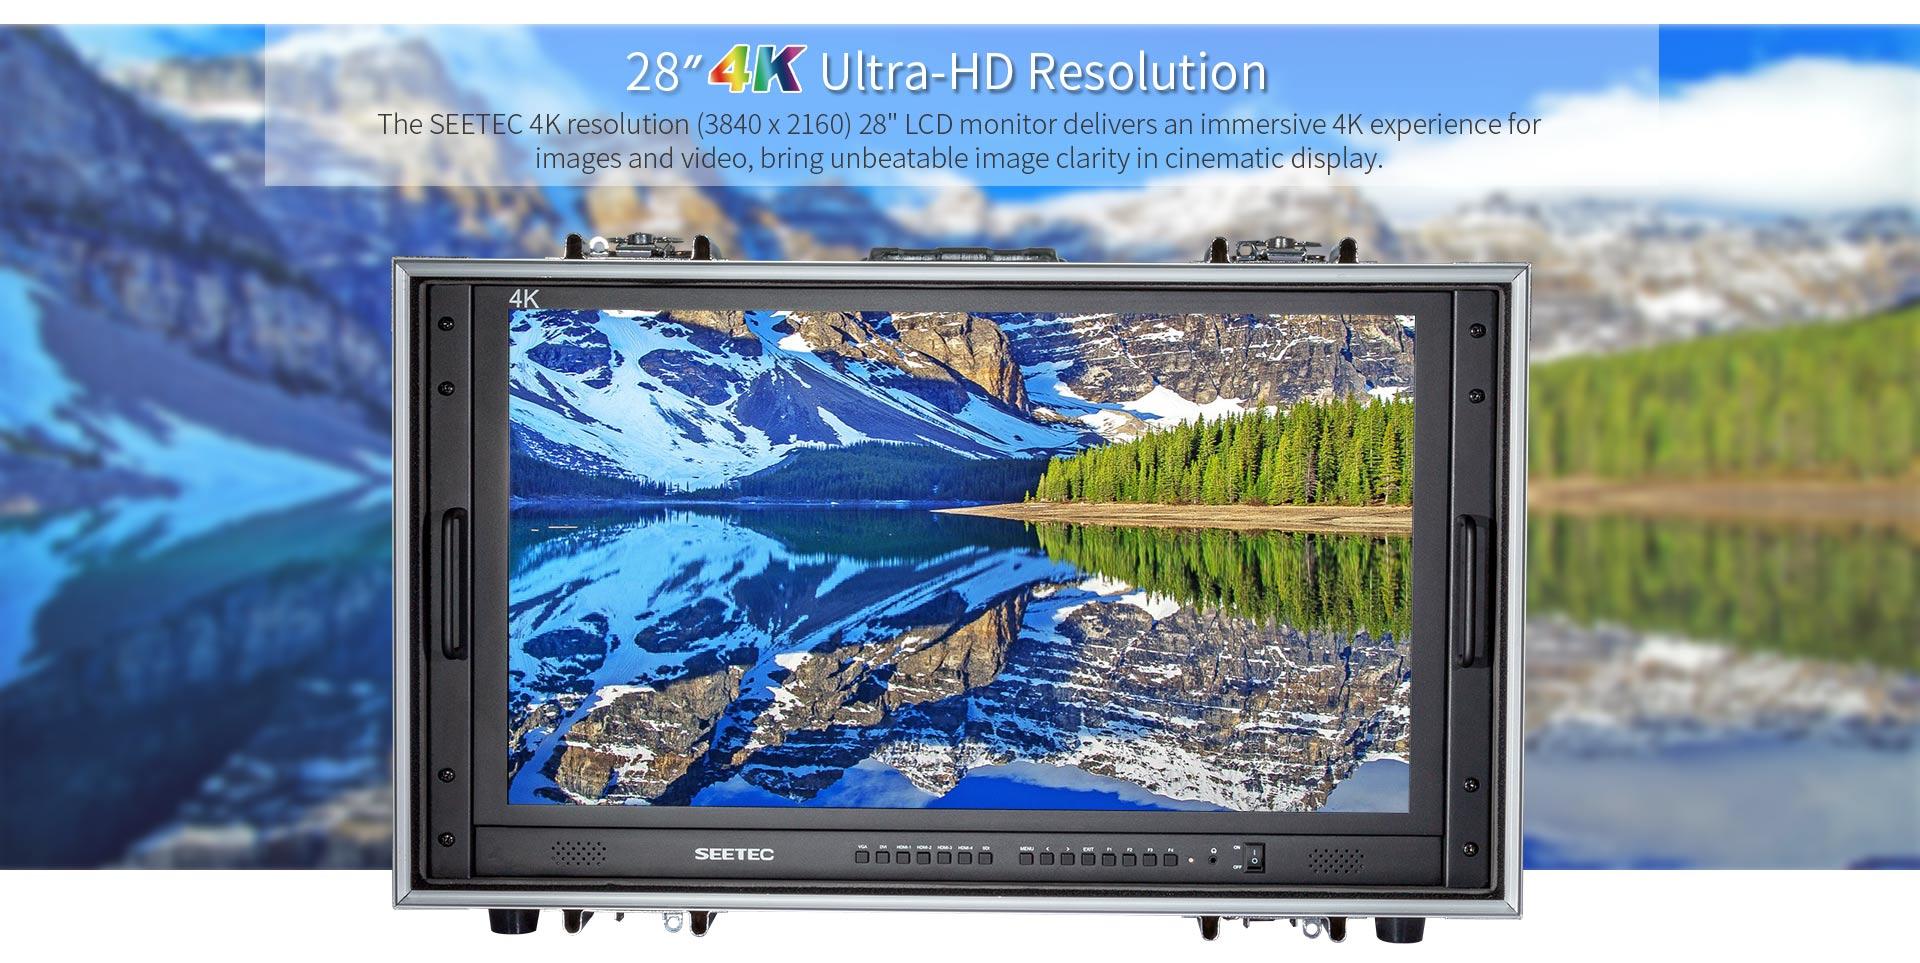 Monitor 4K 28 inch SEETEC